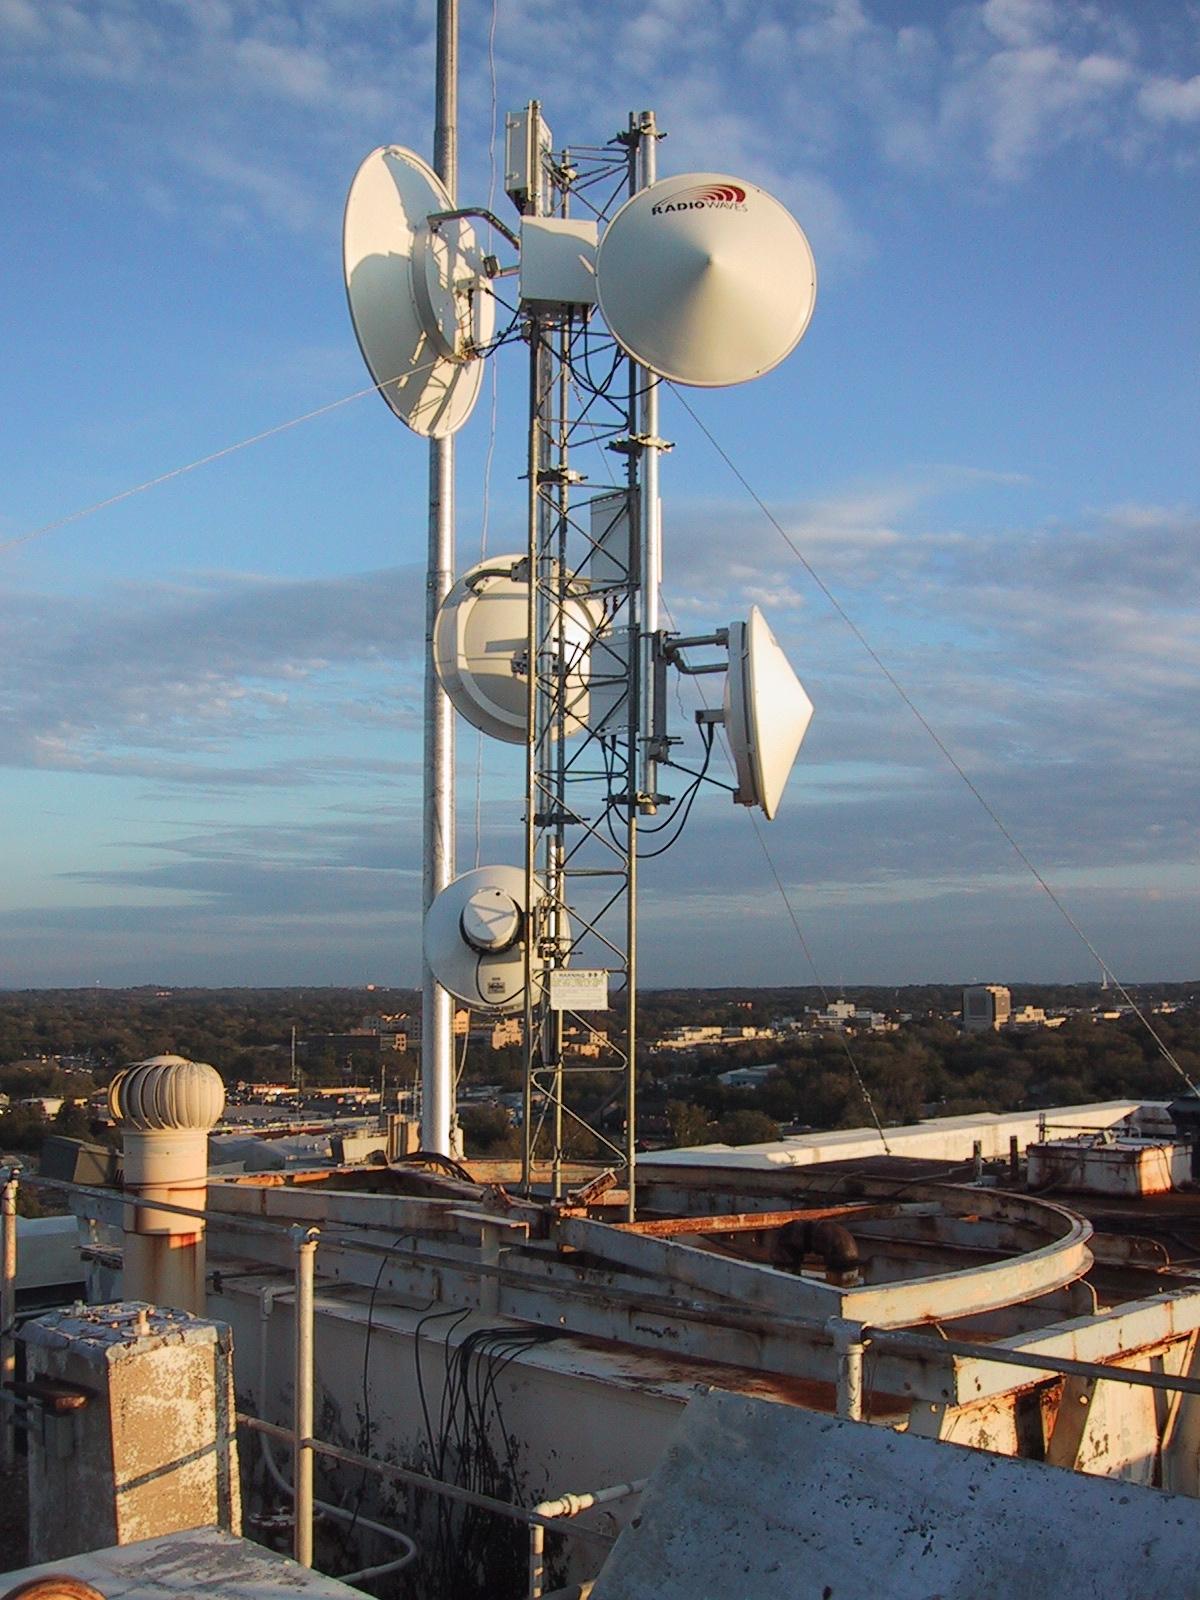 hight resolution of wireless internet service provider